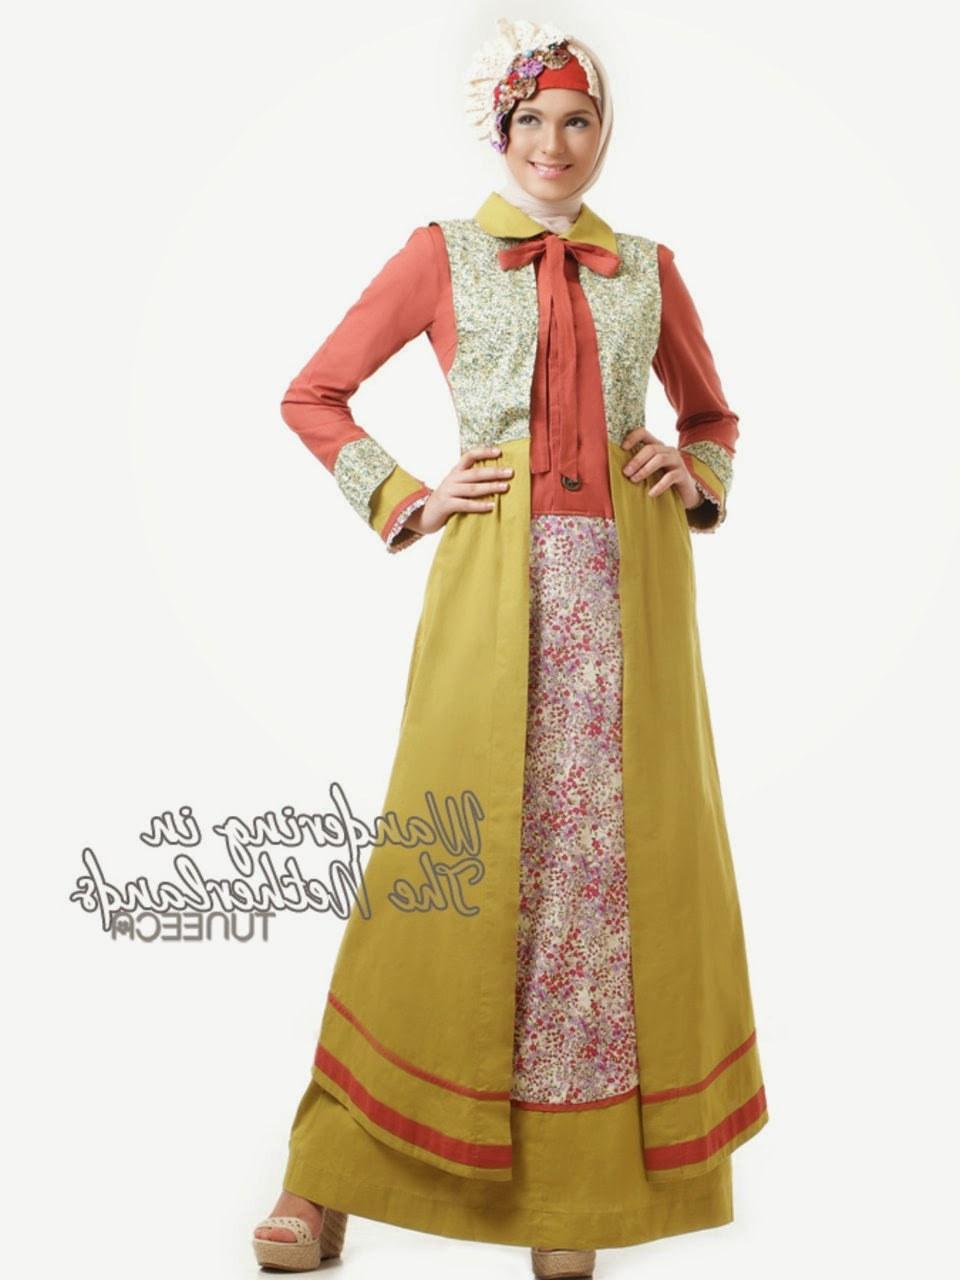 Model Gaya Baju Lebaran Whdr 12 Contoh Model Gamis Muslim Lebaran Terbaru Kumpulan